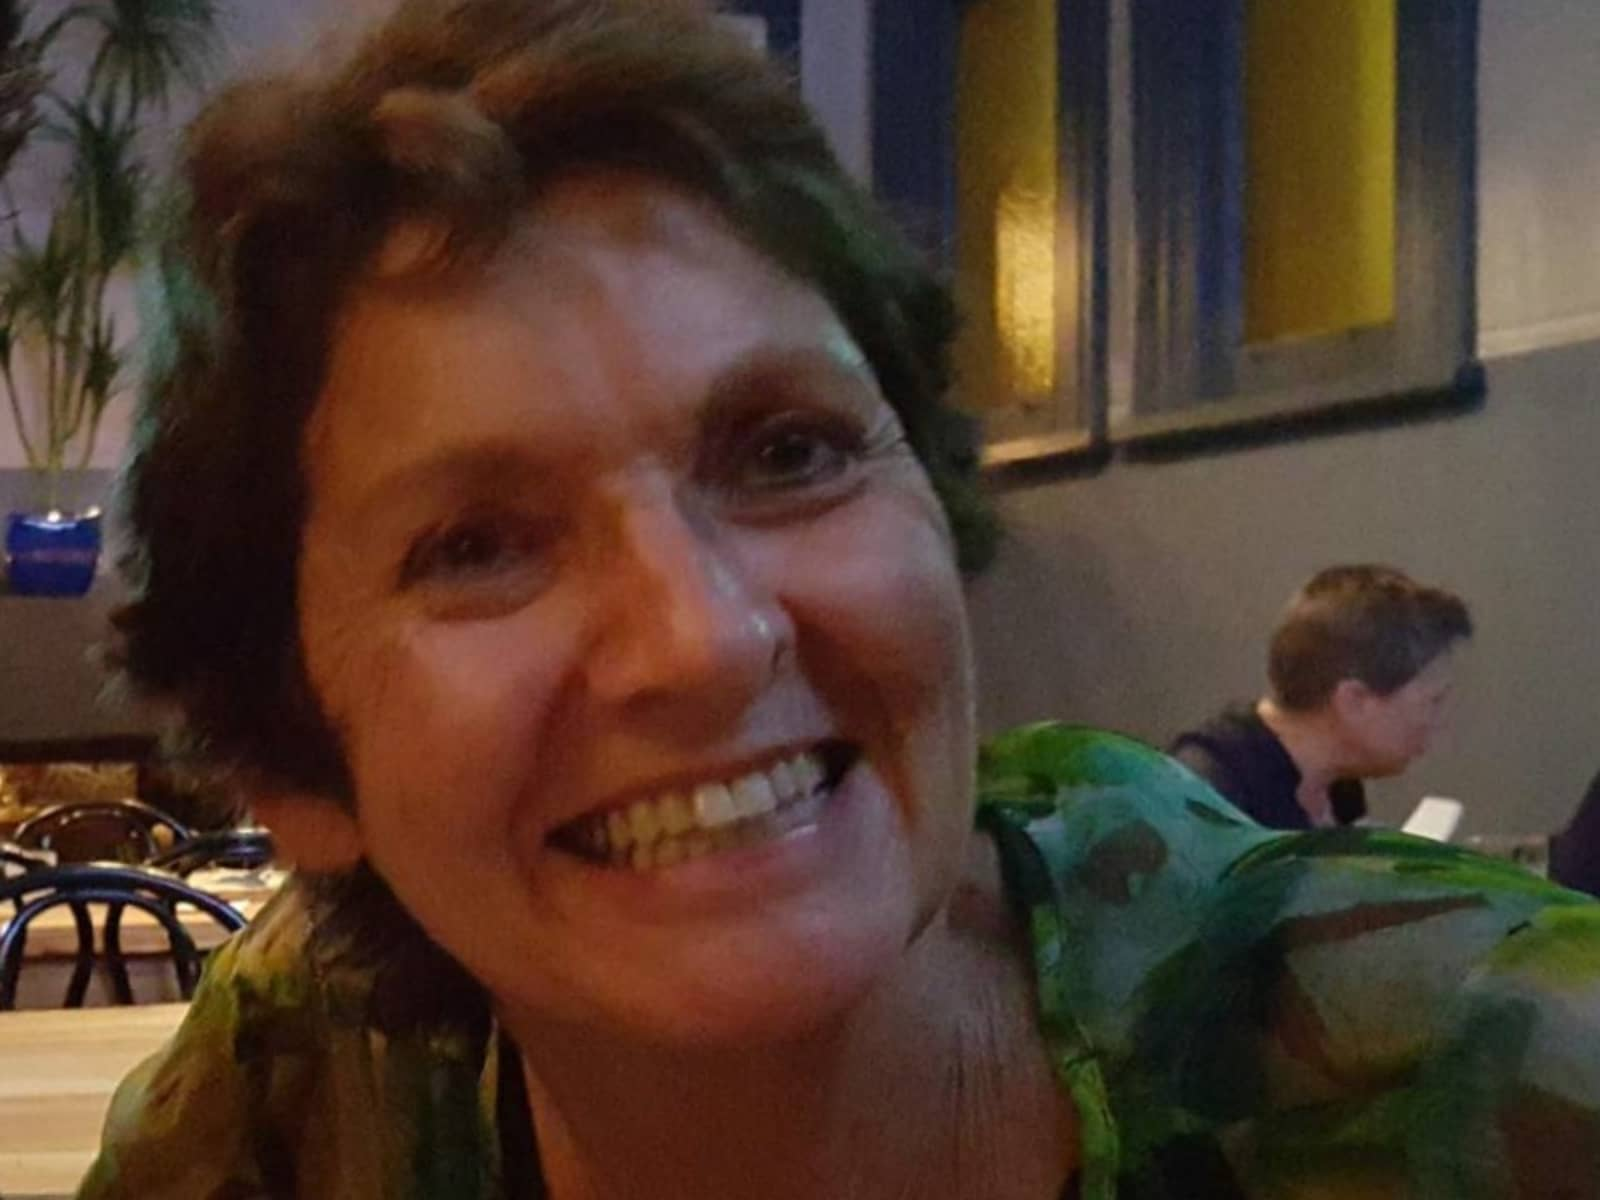 Bernadette from Port Macquarie, New South Wales, Australia